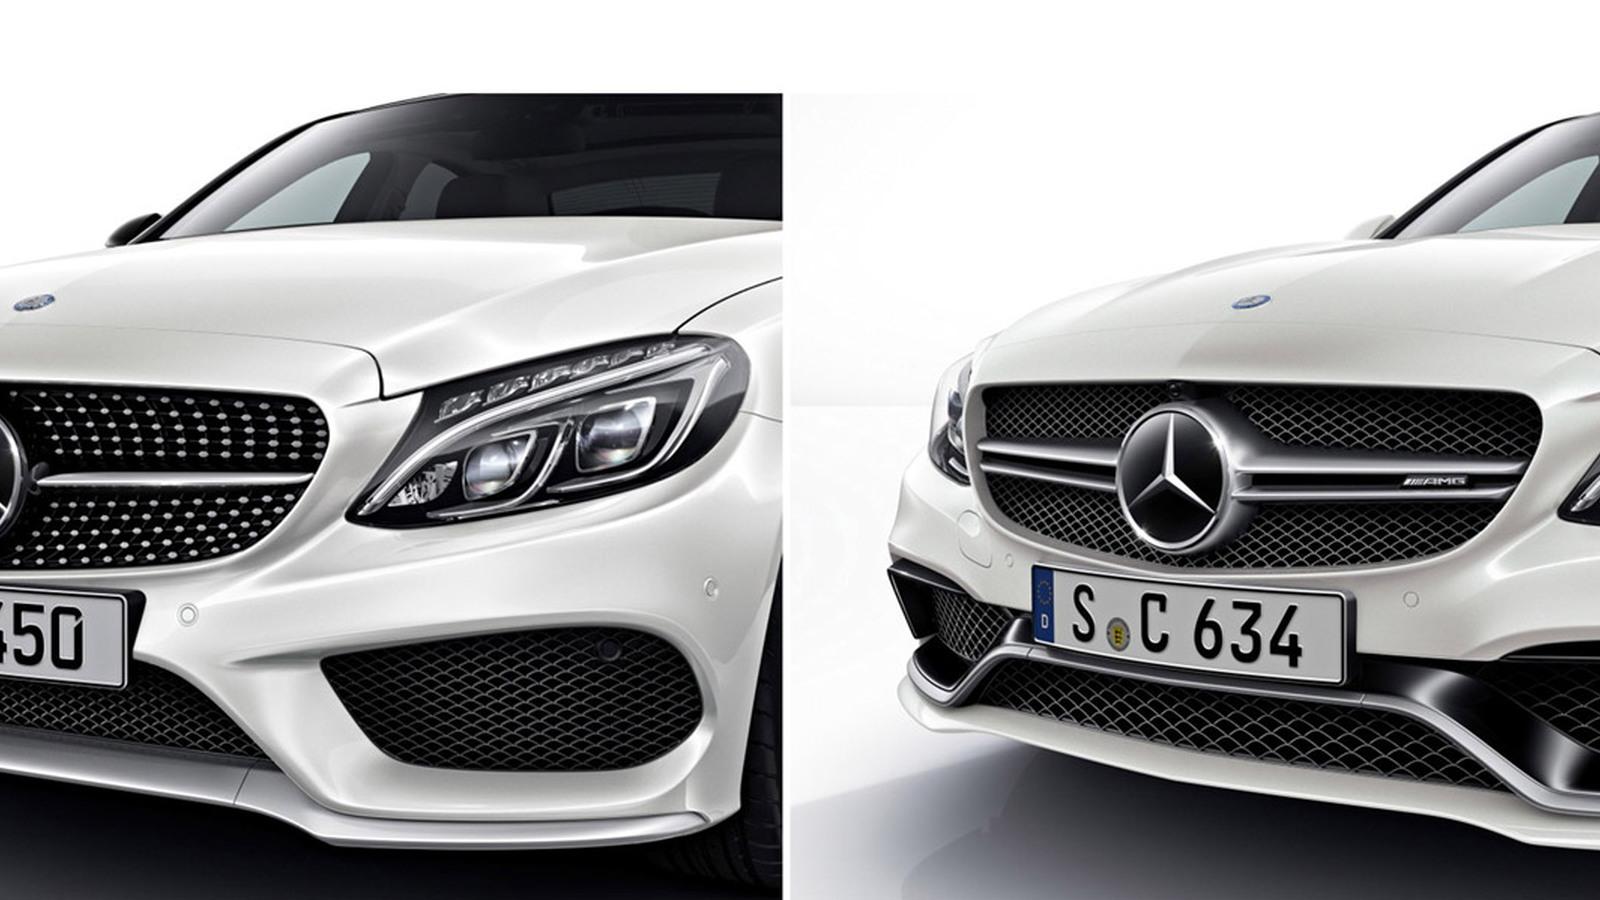 Mercedes-Benz C-Class AMG Sport (left) versus Mercedes-AMG C63